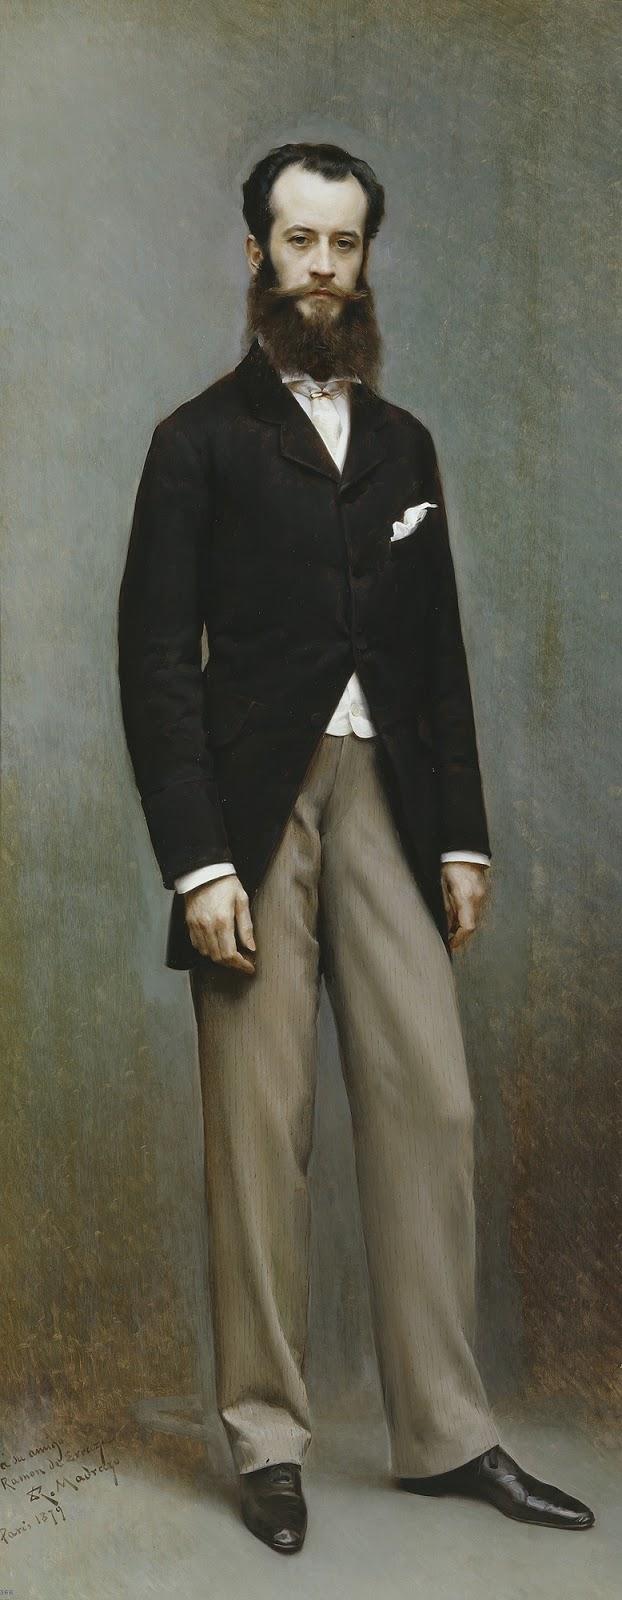 1879_Рамон де Эррацу (Ramon de Errazu)_224 х 96,5_х.,м._Мадрид, музей Прадо.jpg